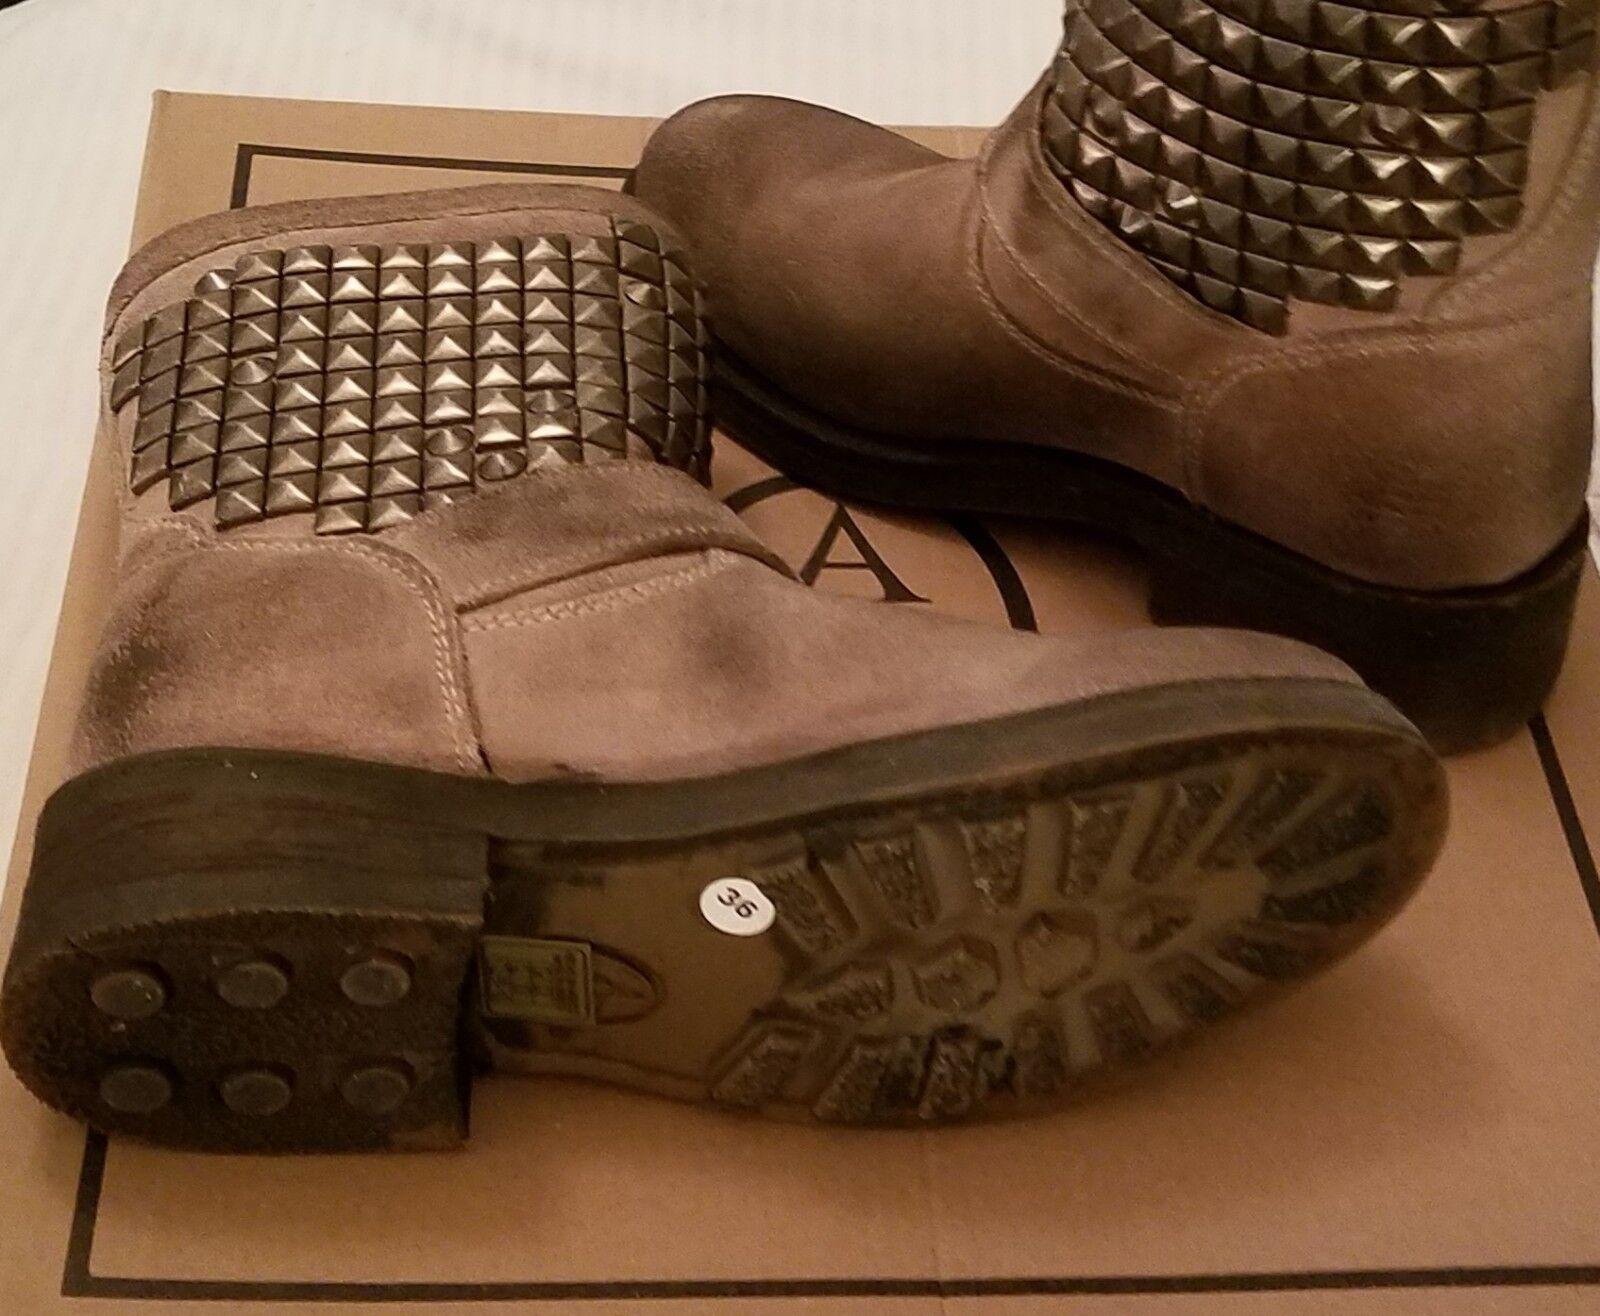 ASH Titan Clay Suede Leather Studded Ankle Biker Stiefel schuhe schuhe schuhe 36 (6M) BRAND NEW c274b1